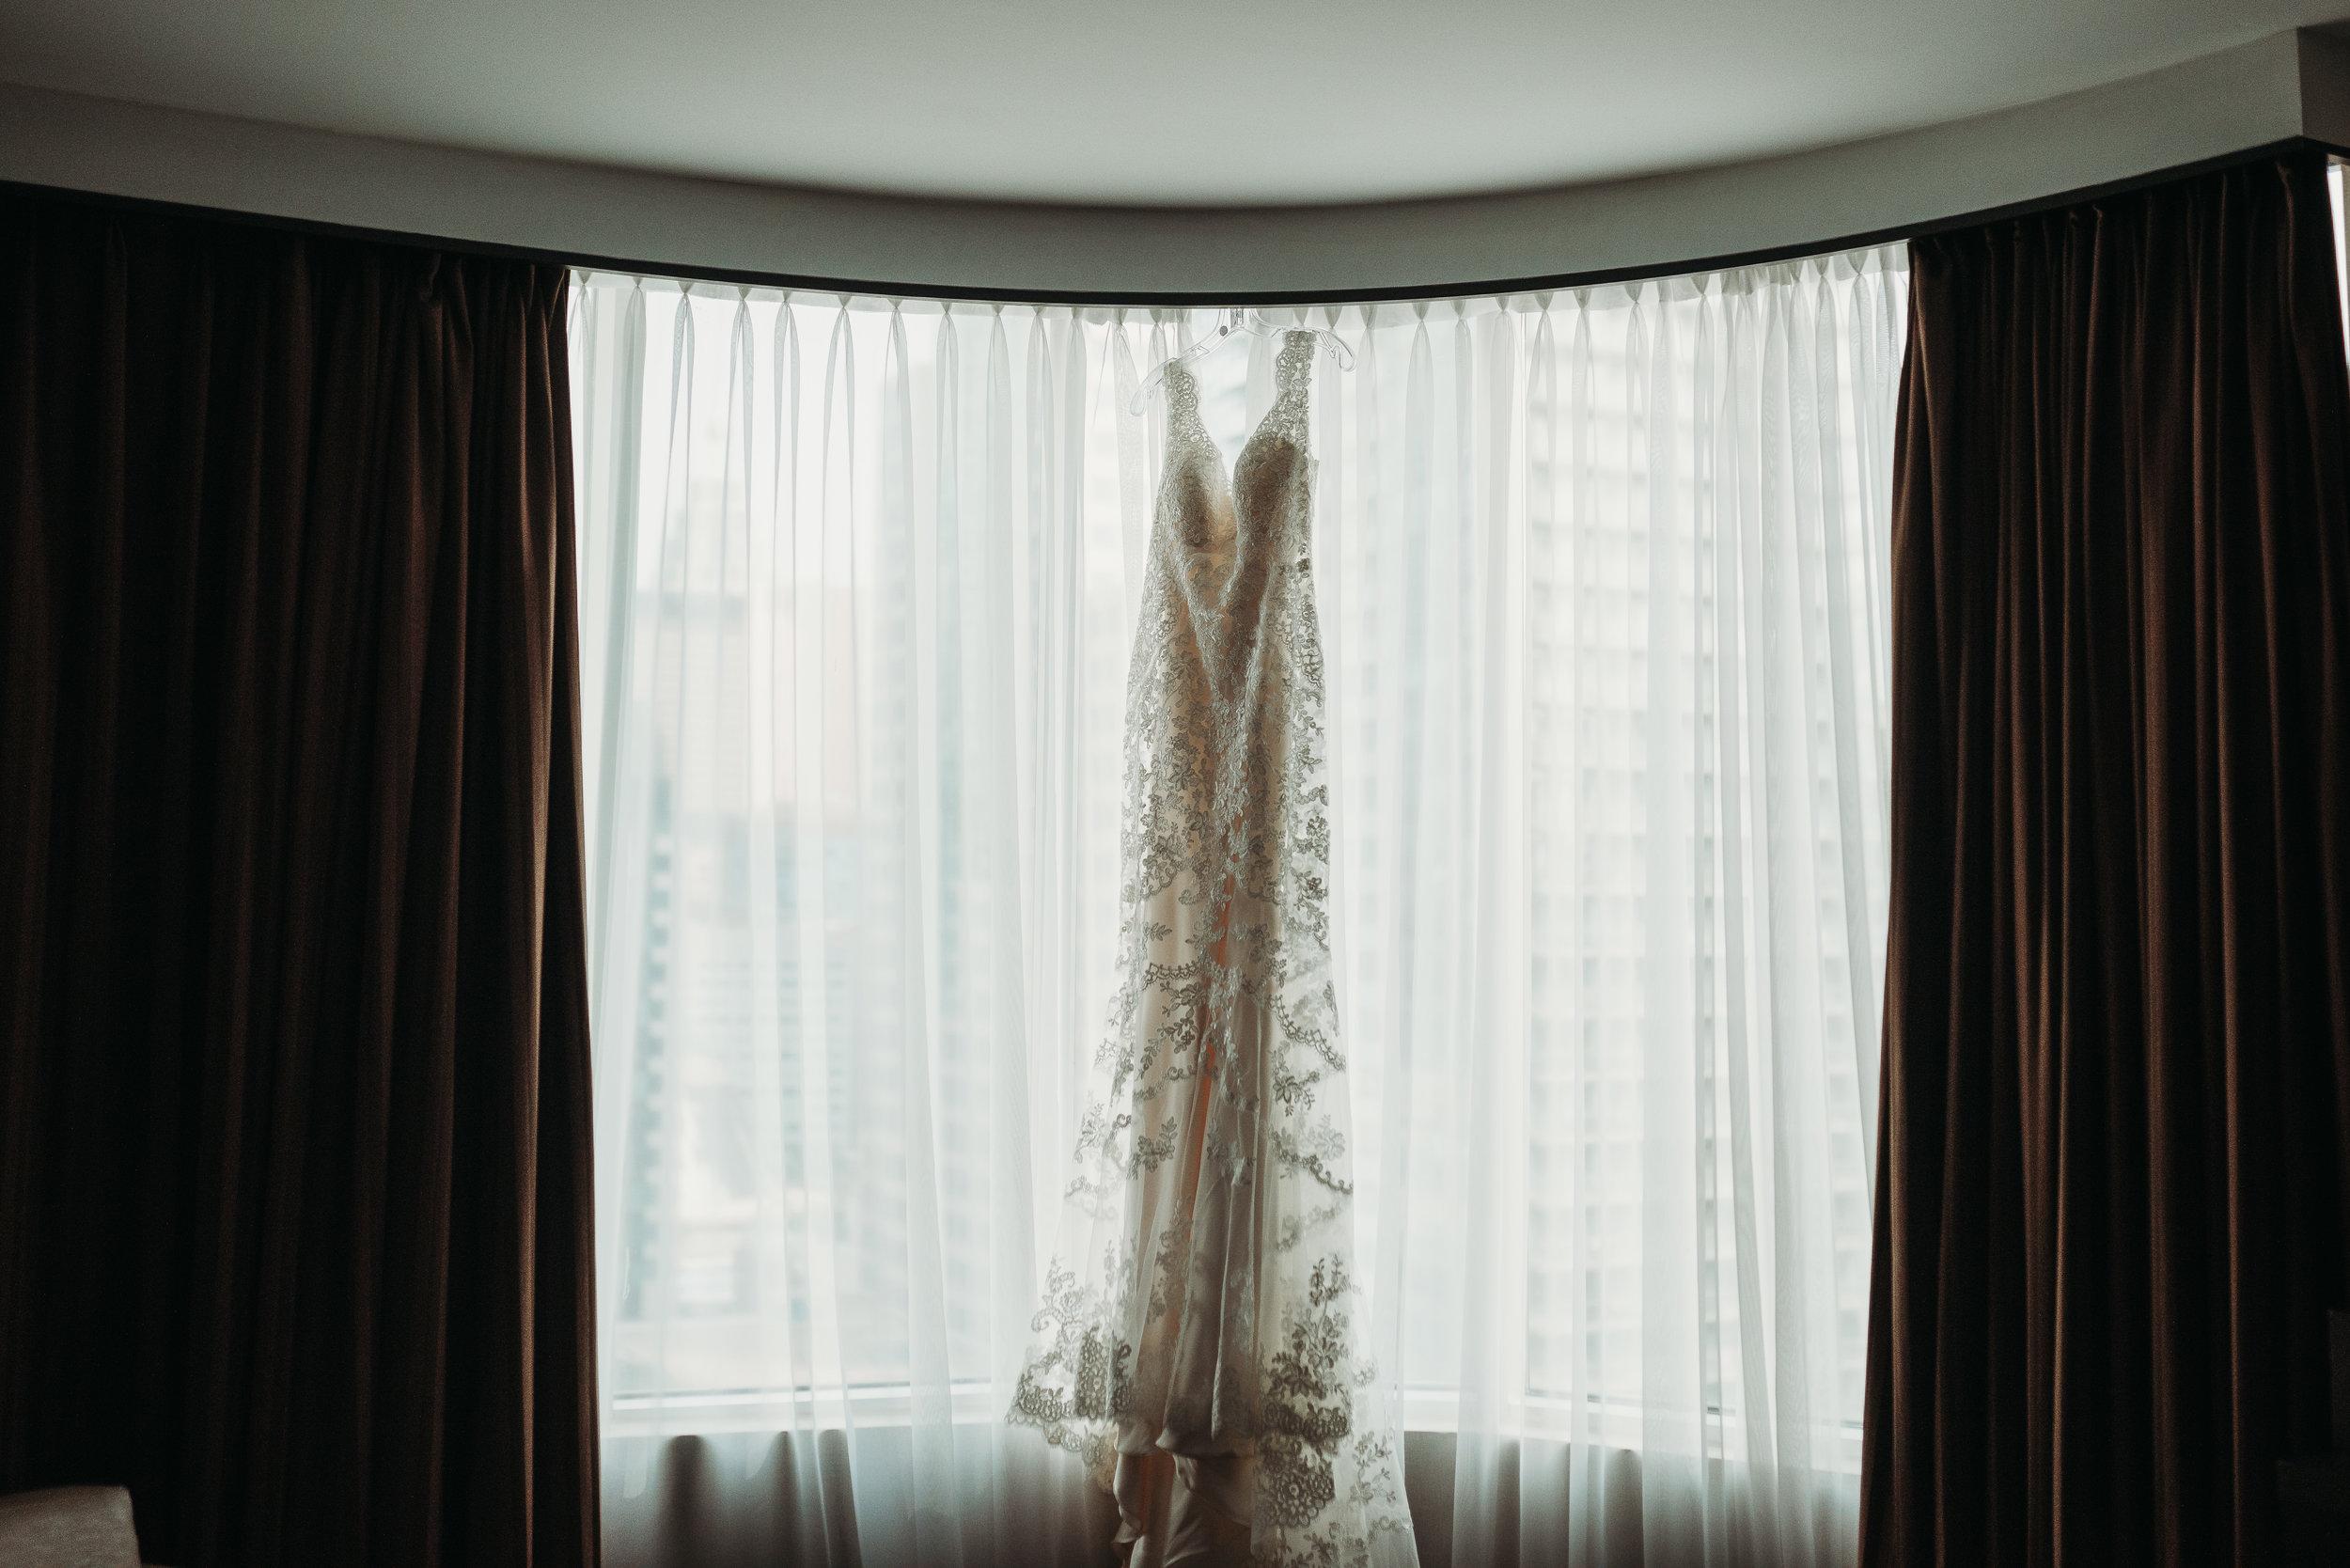 wedding-dress-toronto-rustic-boho-airship37-wedding-by-willow-birch-photo-toronto-documentary-wedding-photographers.jpg